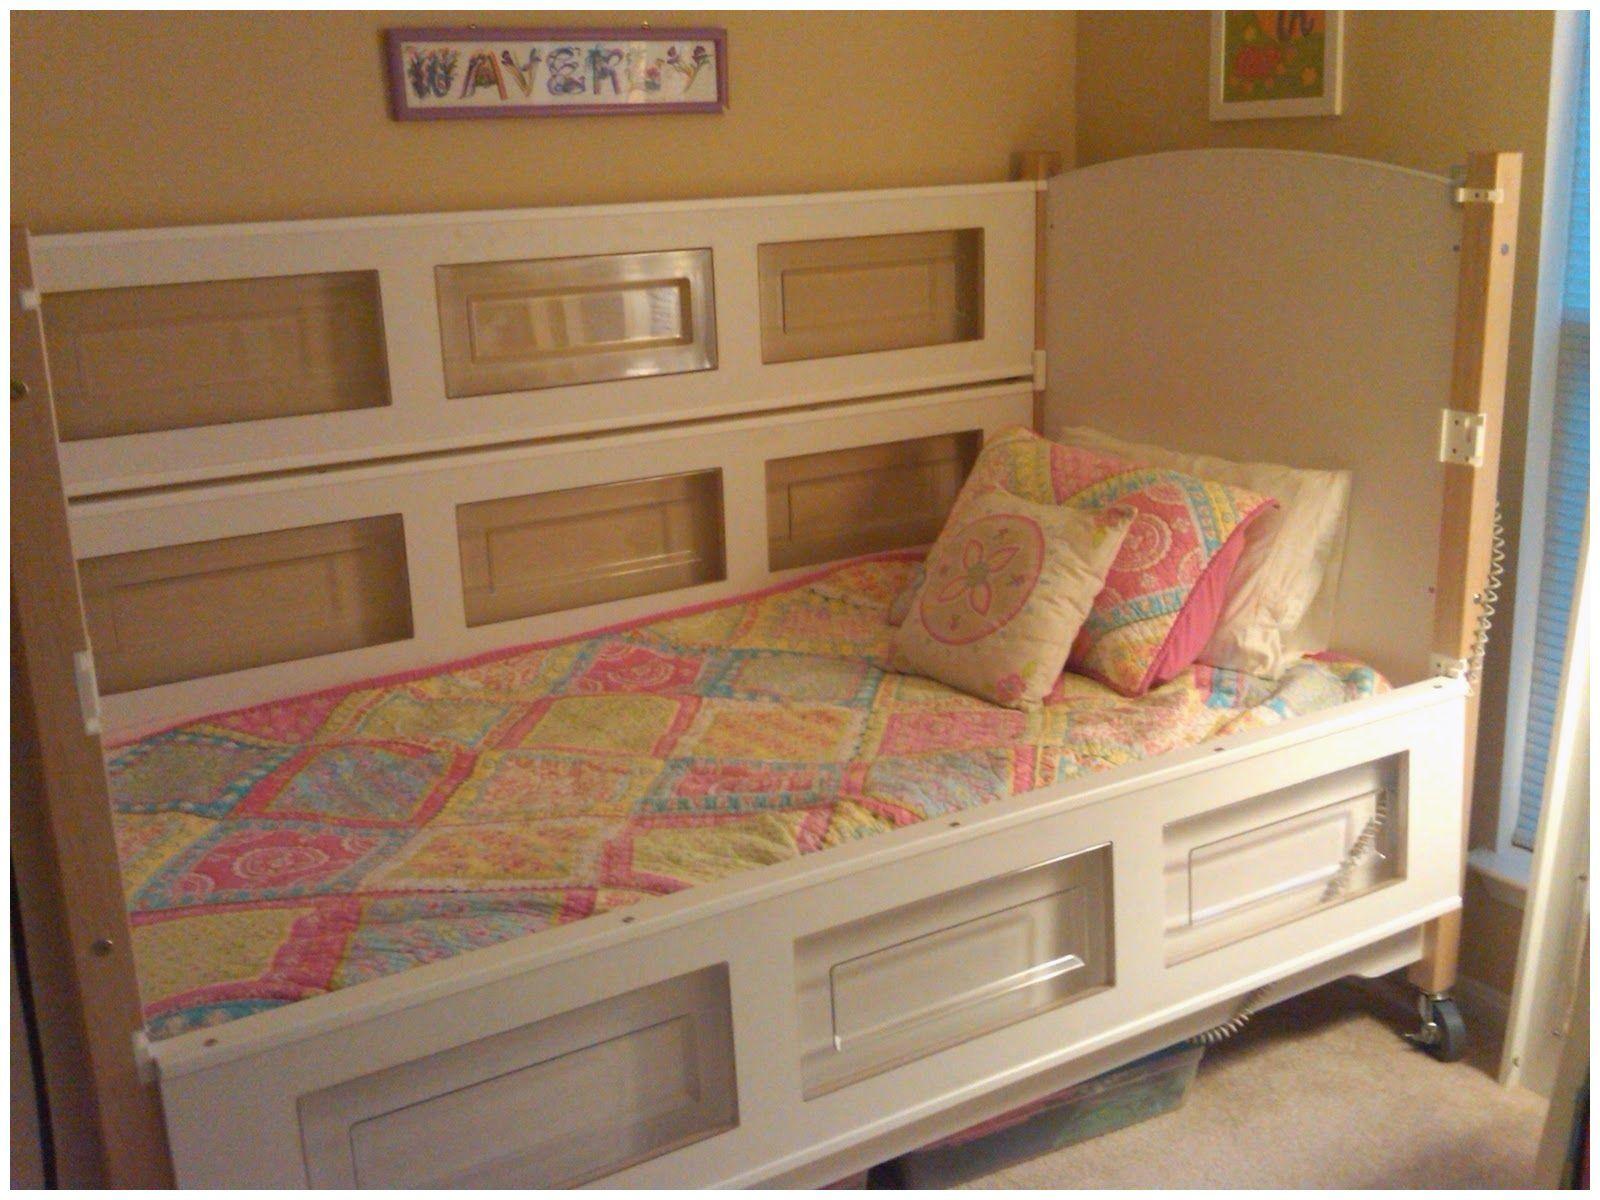 0db A1e768a1f61f2d1fe97f3a5 Bedroom Set For Toddler Of Bedroom Set In 2020 Bedroom Sets For Sale Kids Room Furniture Kids Bedroom Furniture